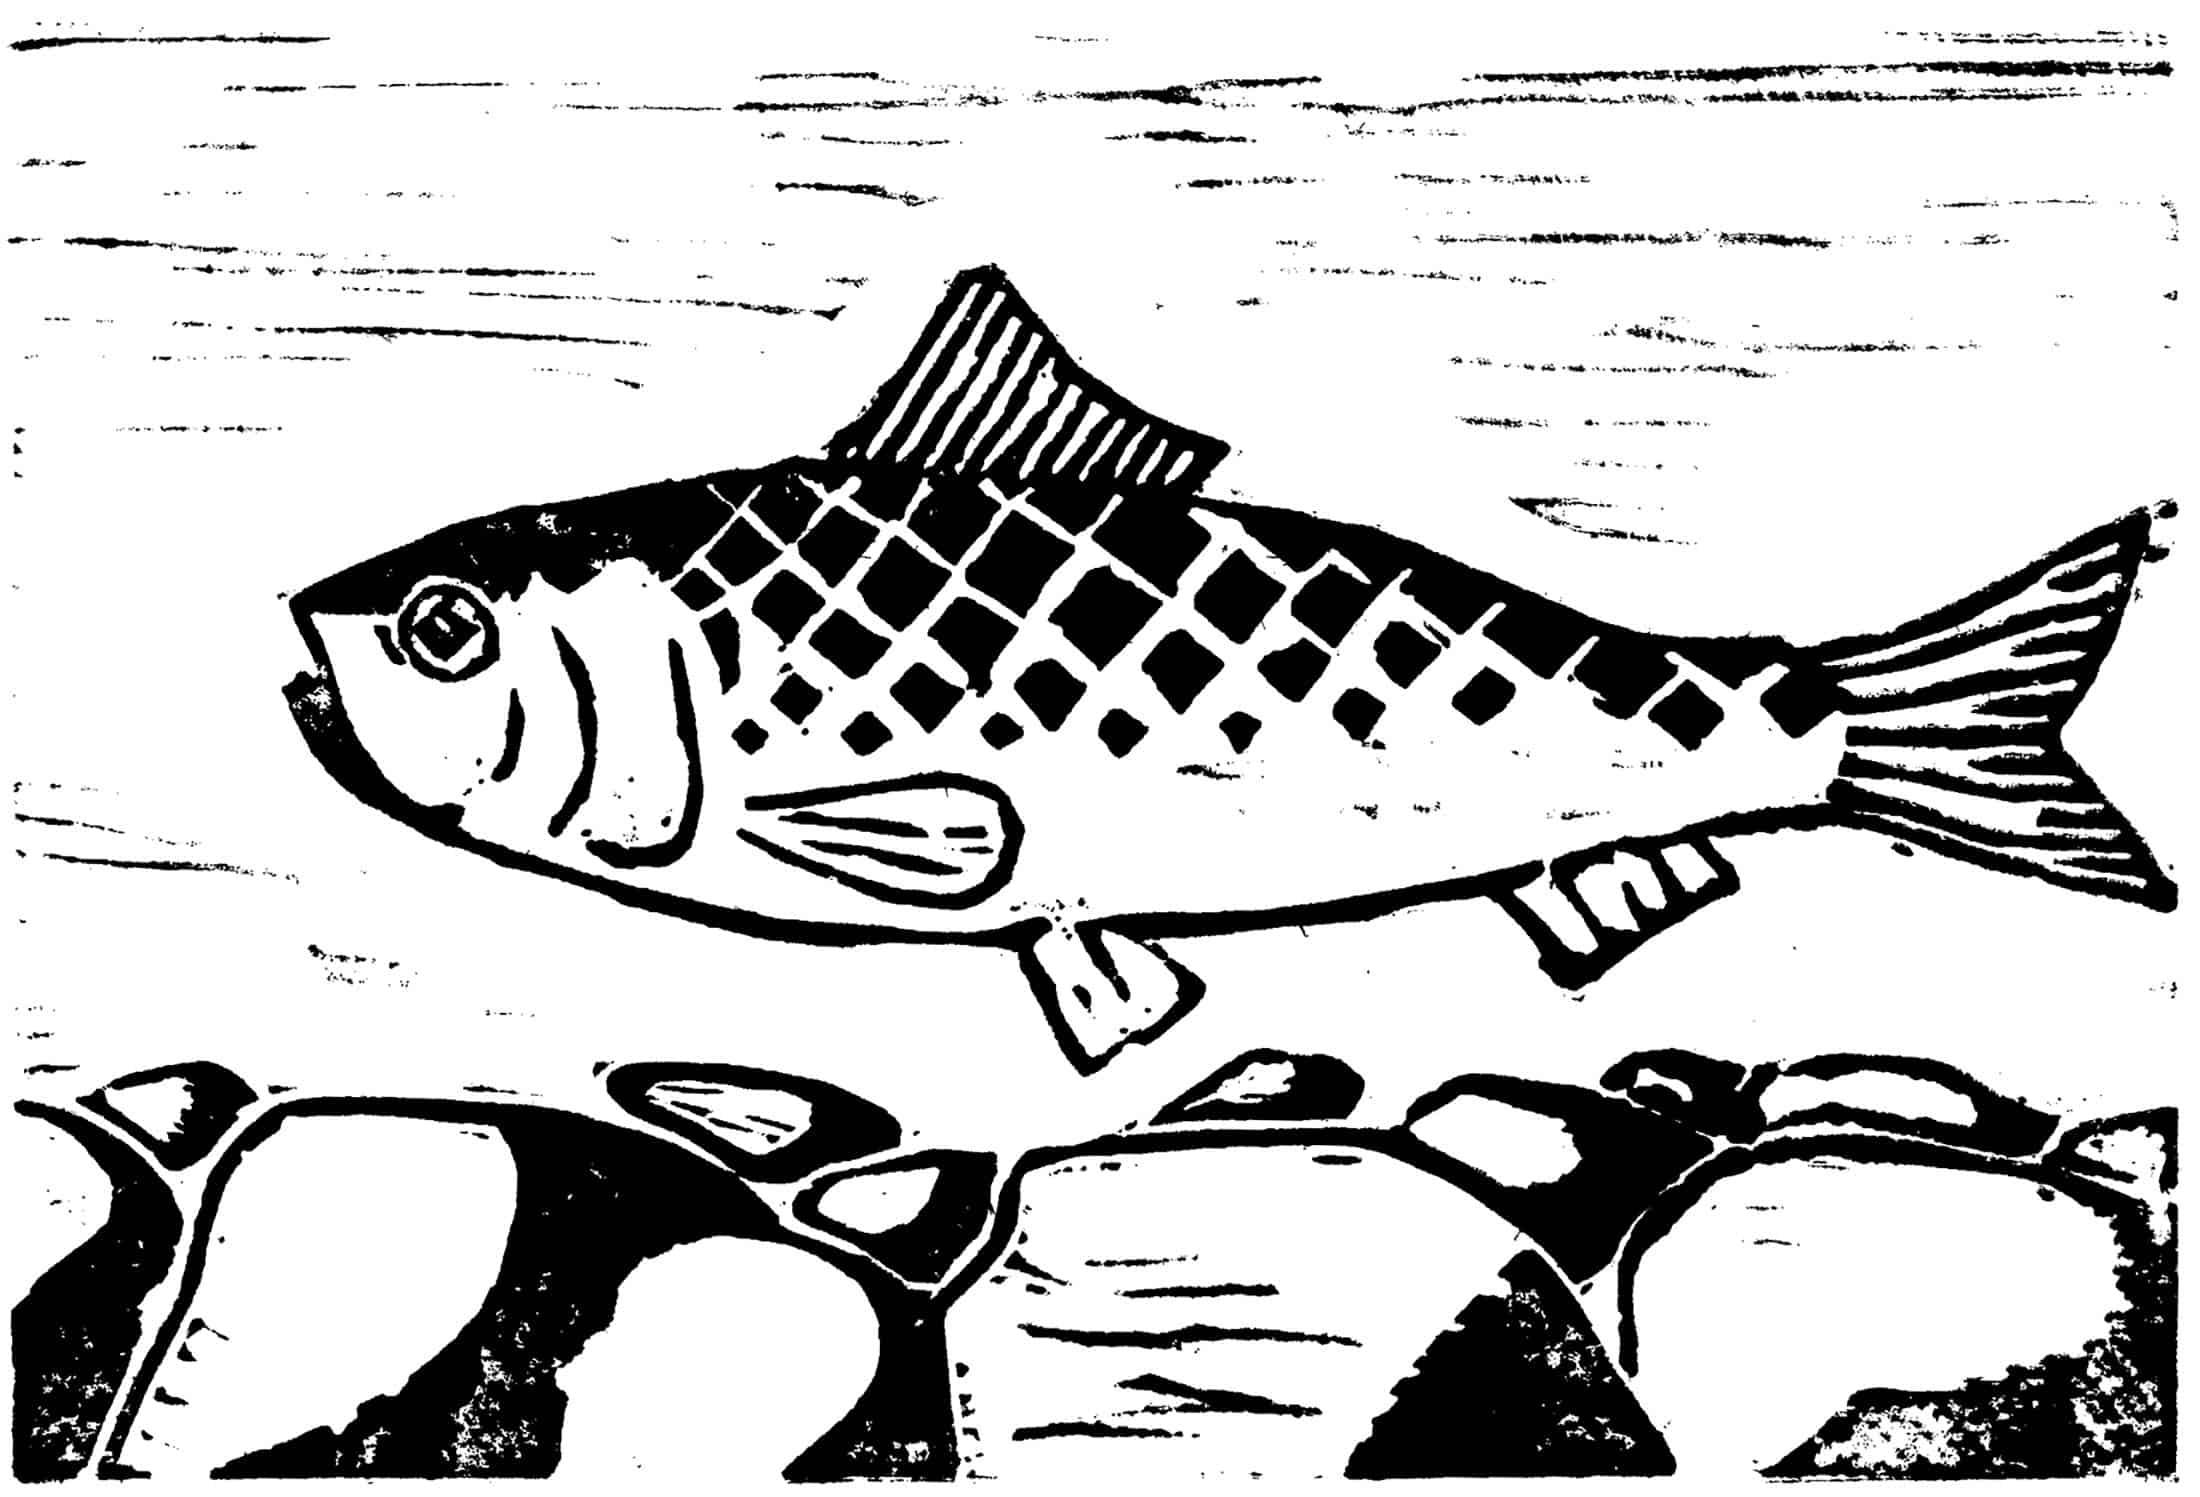 Neil Gabrielson, Alewife, 2019, linocut print, 6 x 8 inches